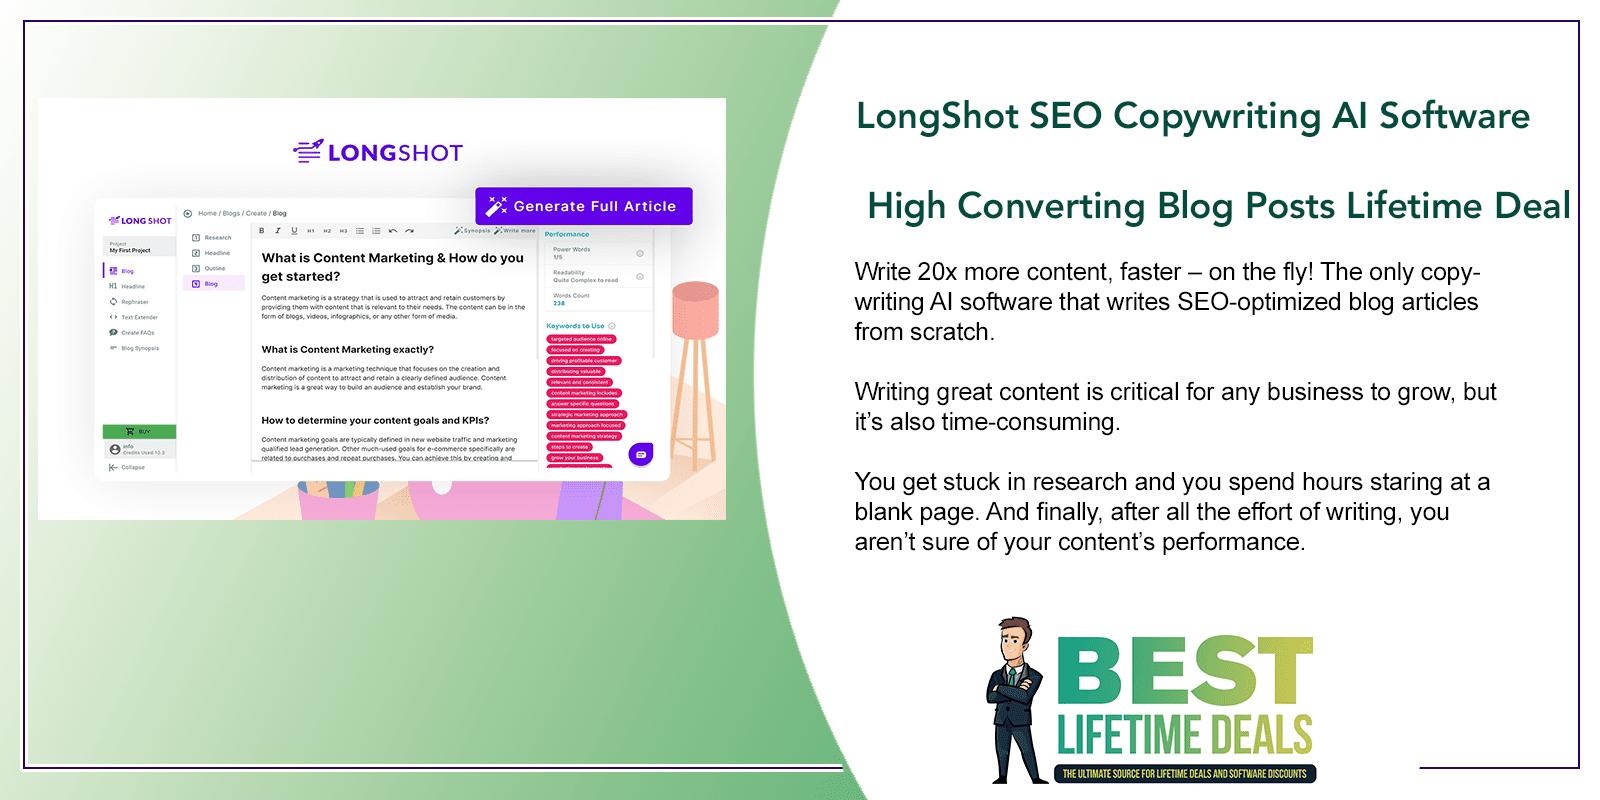 LongShot SEO Copywriting AI Software High Converting Blog Posts